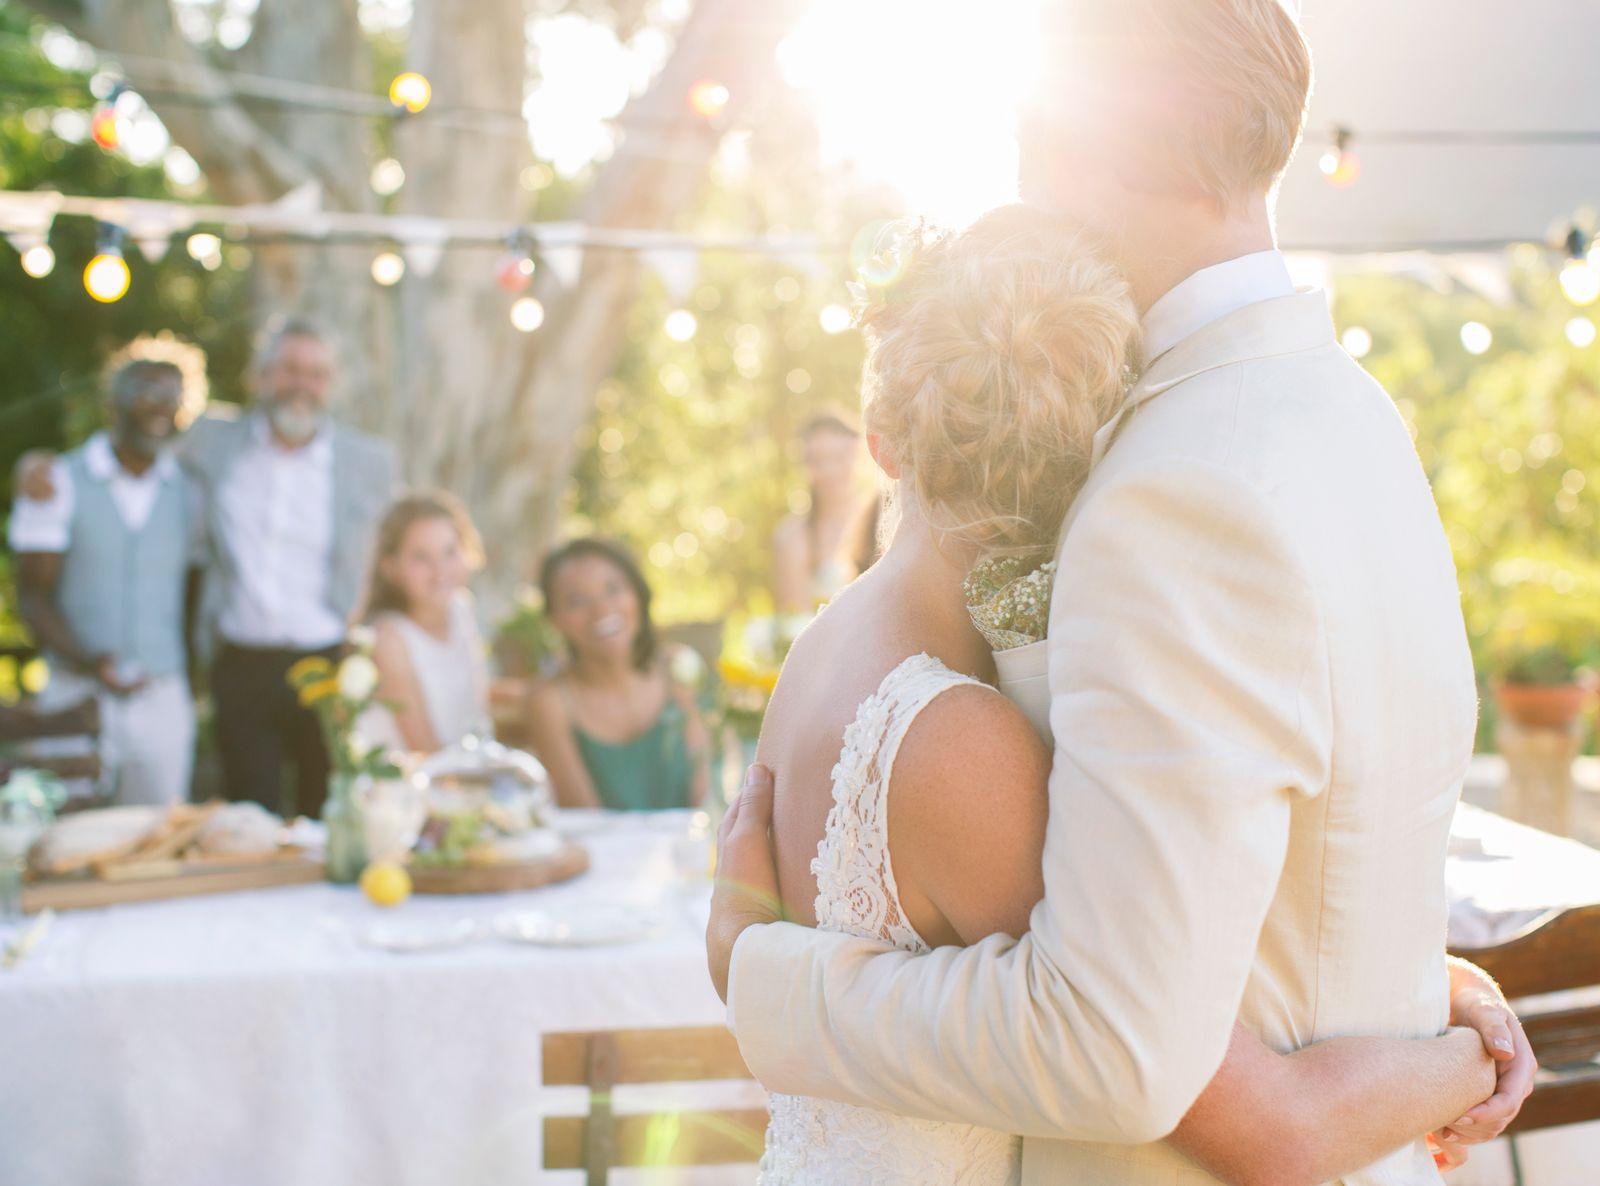 Lindsay Landman shares her tips on how to plan a wedding like a pro.